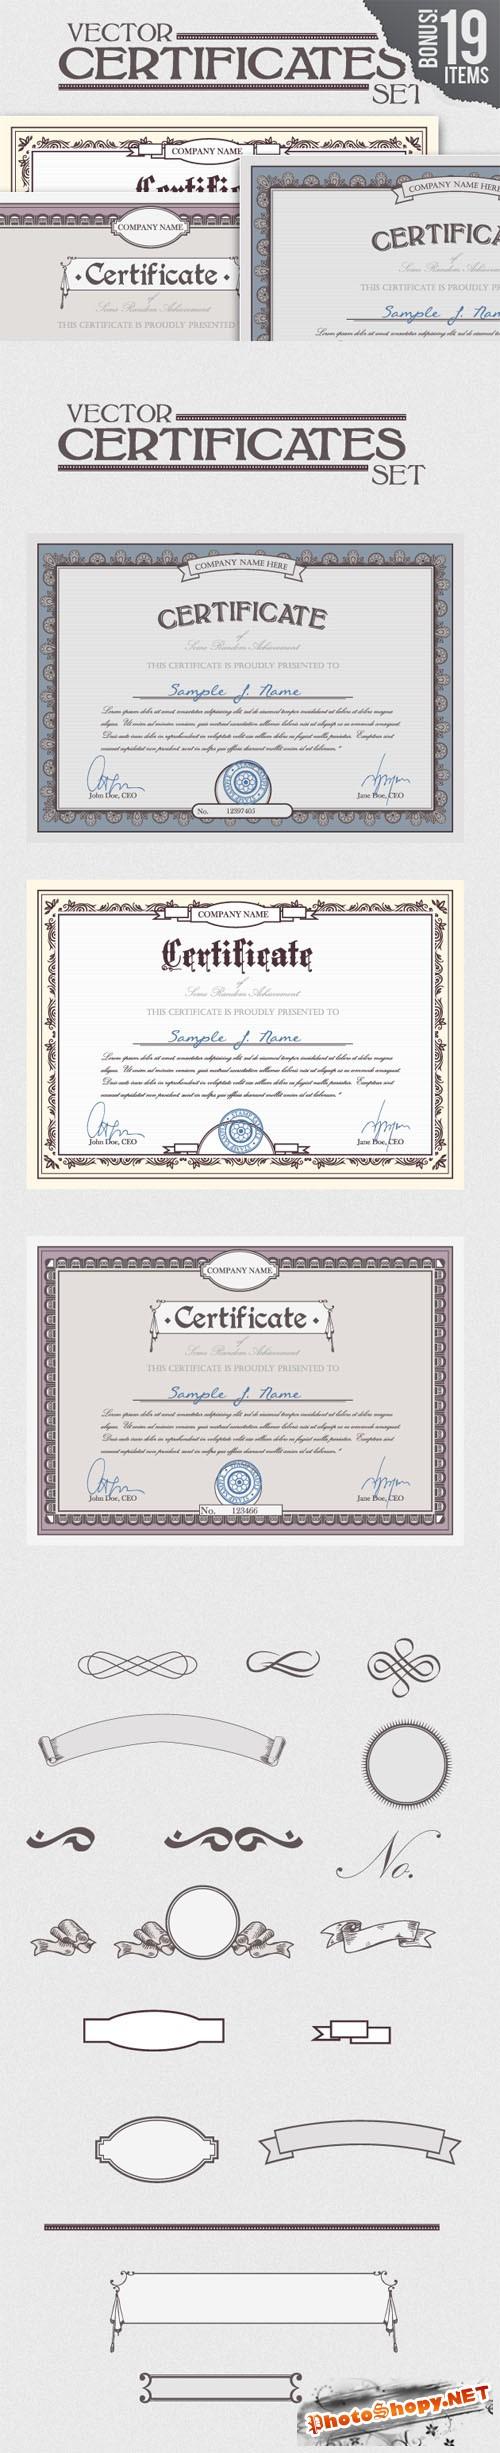 Designtnt - Certificate Vector Templates